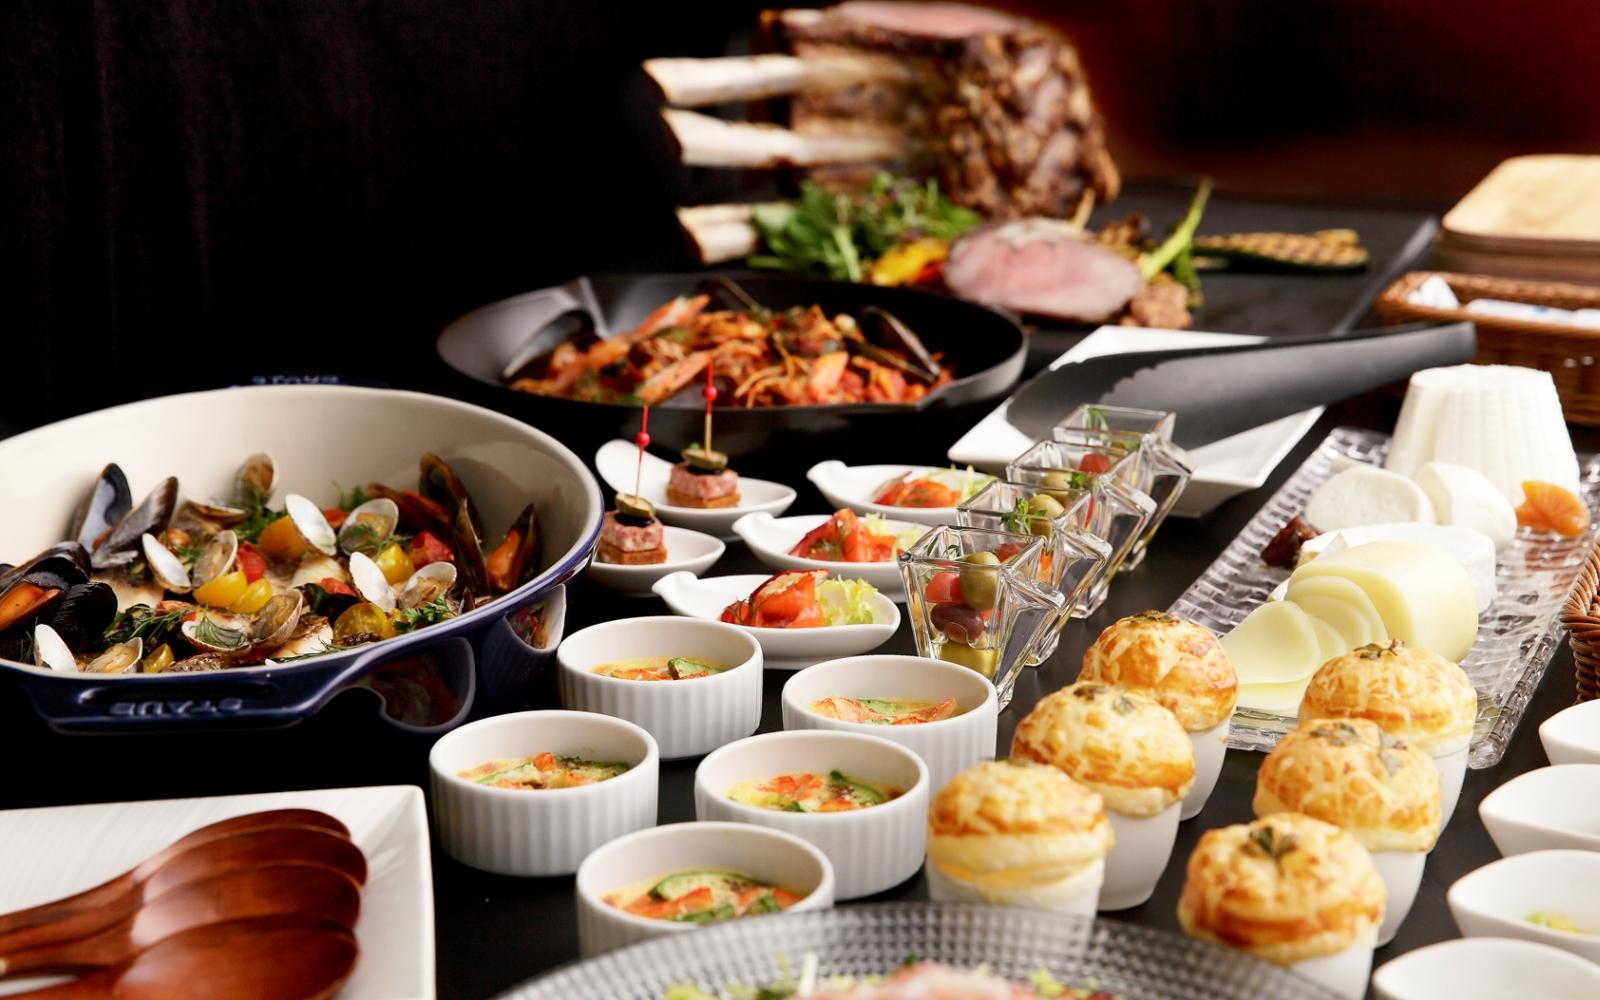 SLOPE-SIDE-DINER-ZAKURO-buffet-restaurant-top-grand-prince-hotel-new-takanawa